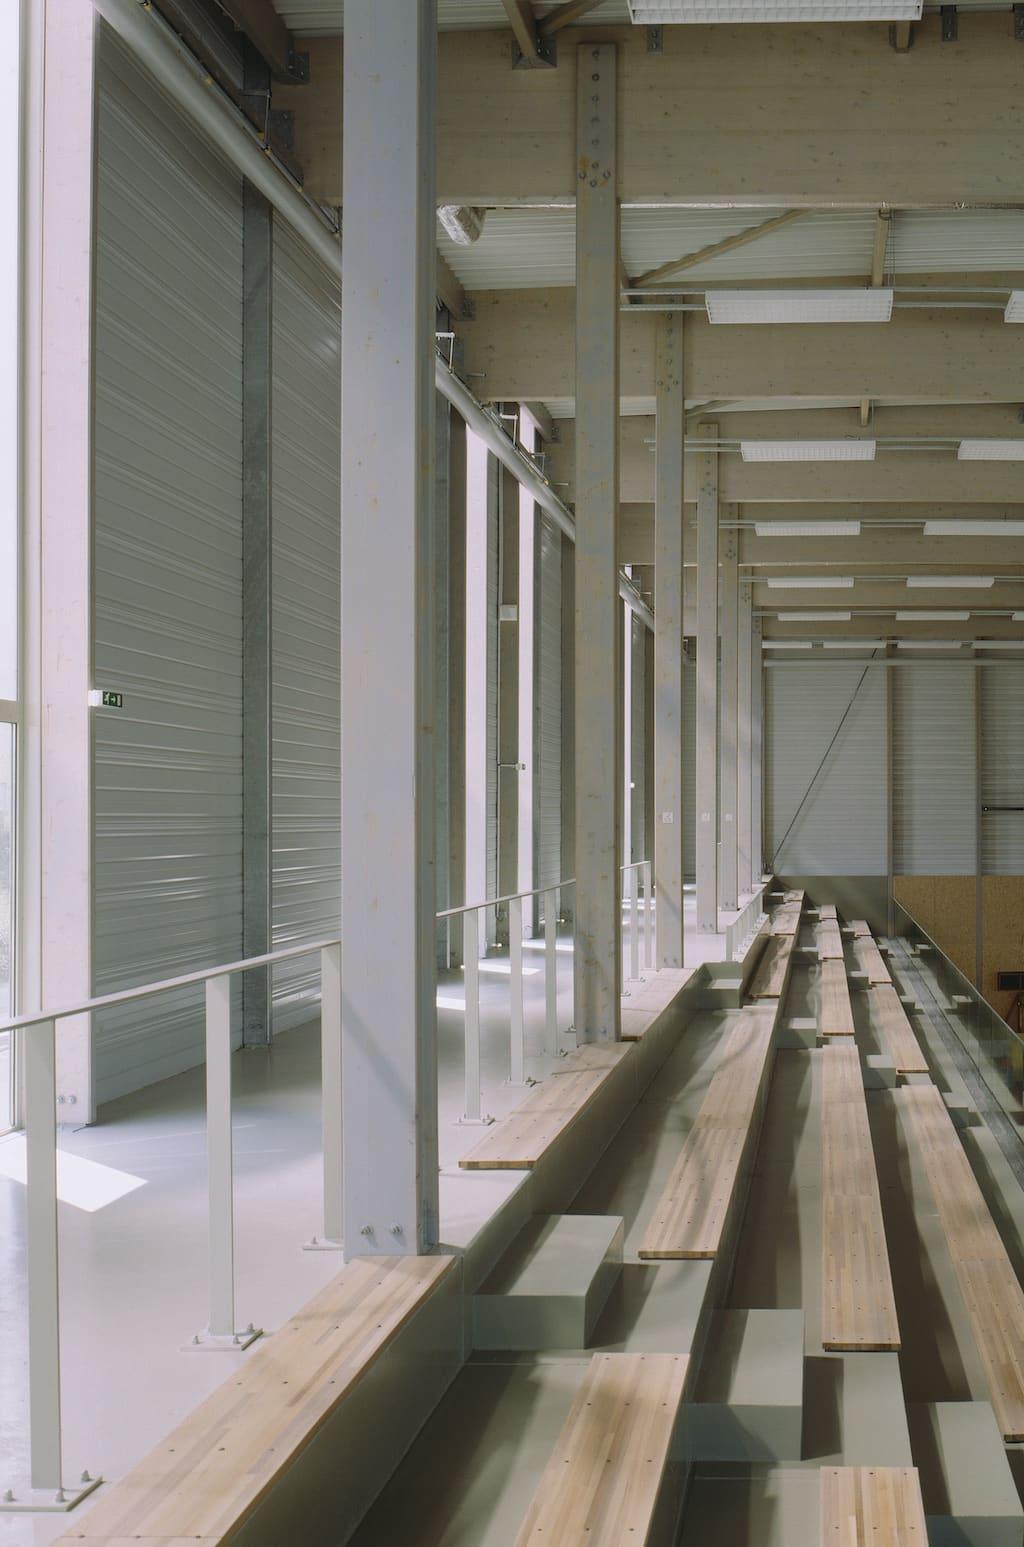 Alencon 06 - Salle de gymnastique et salle de tennis de table – Alençon